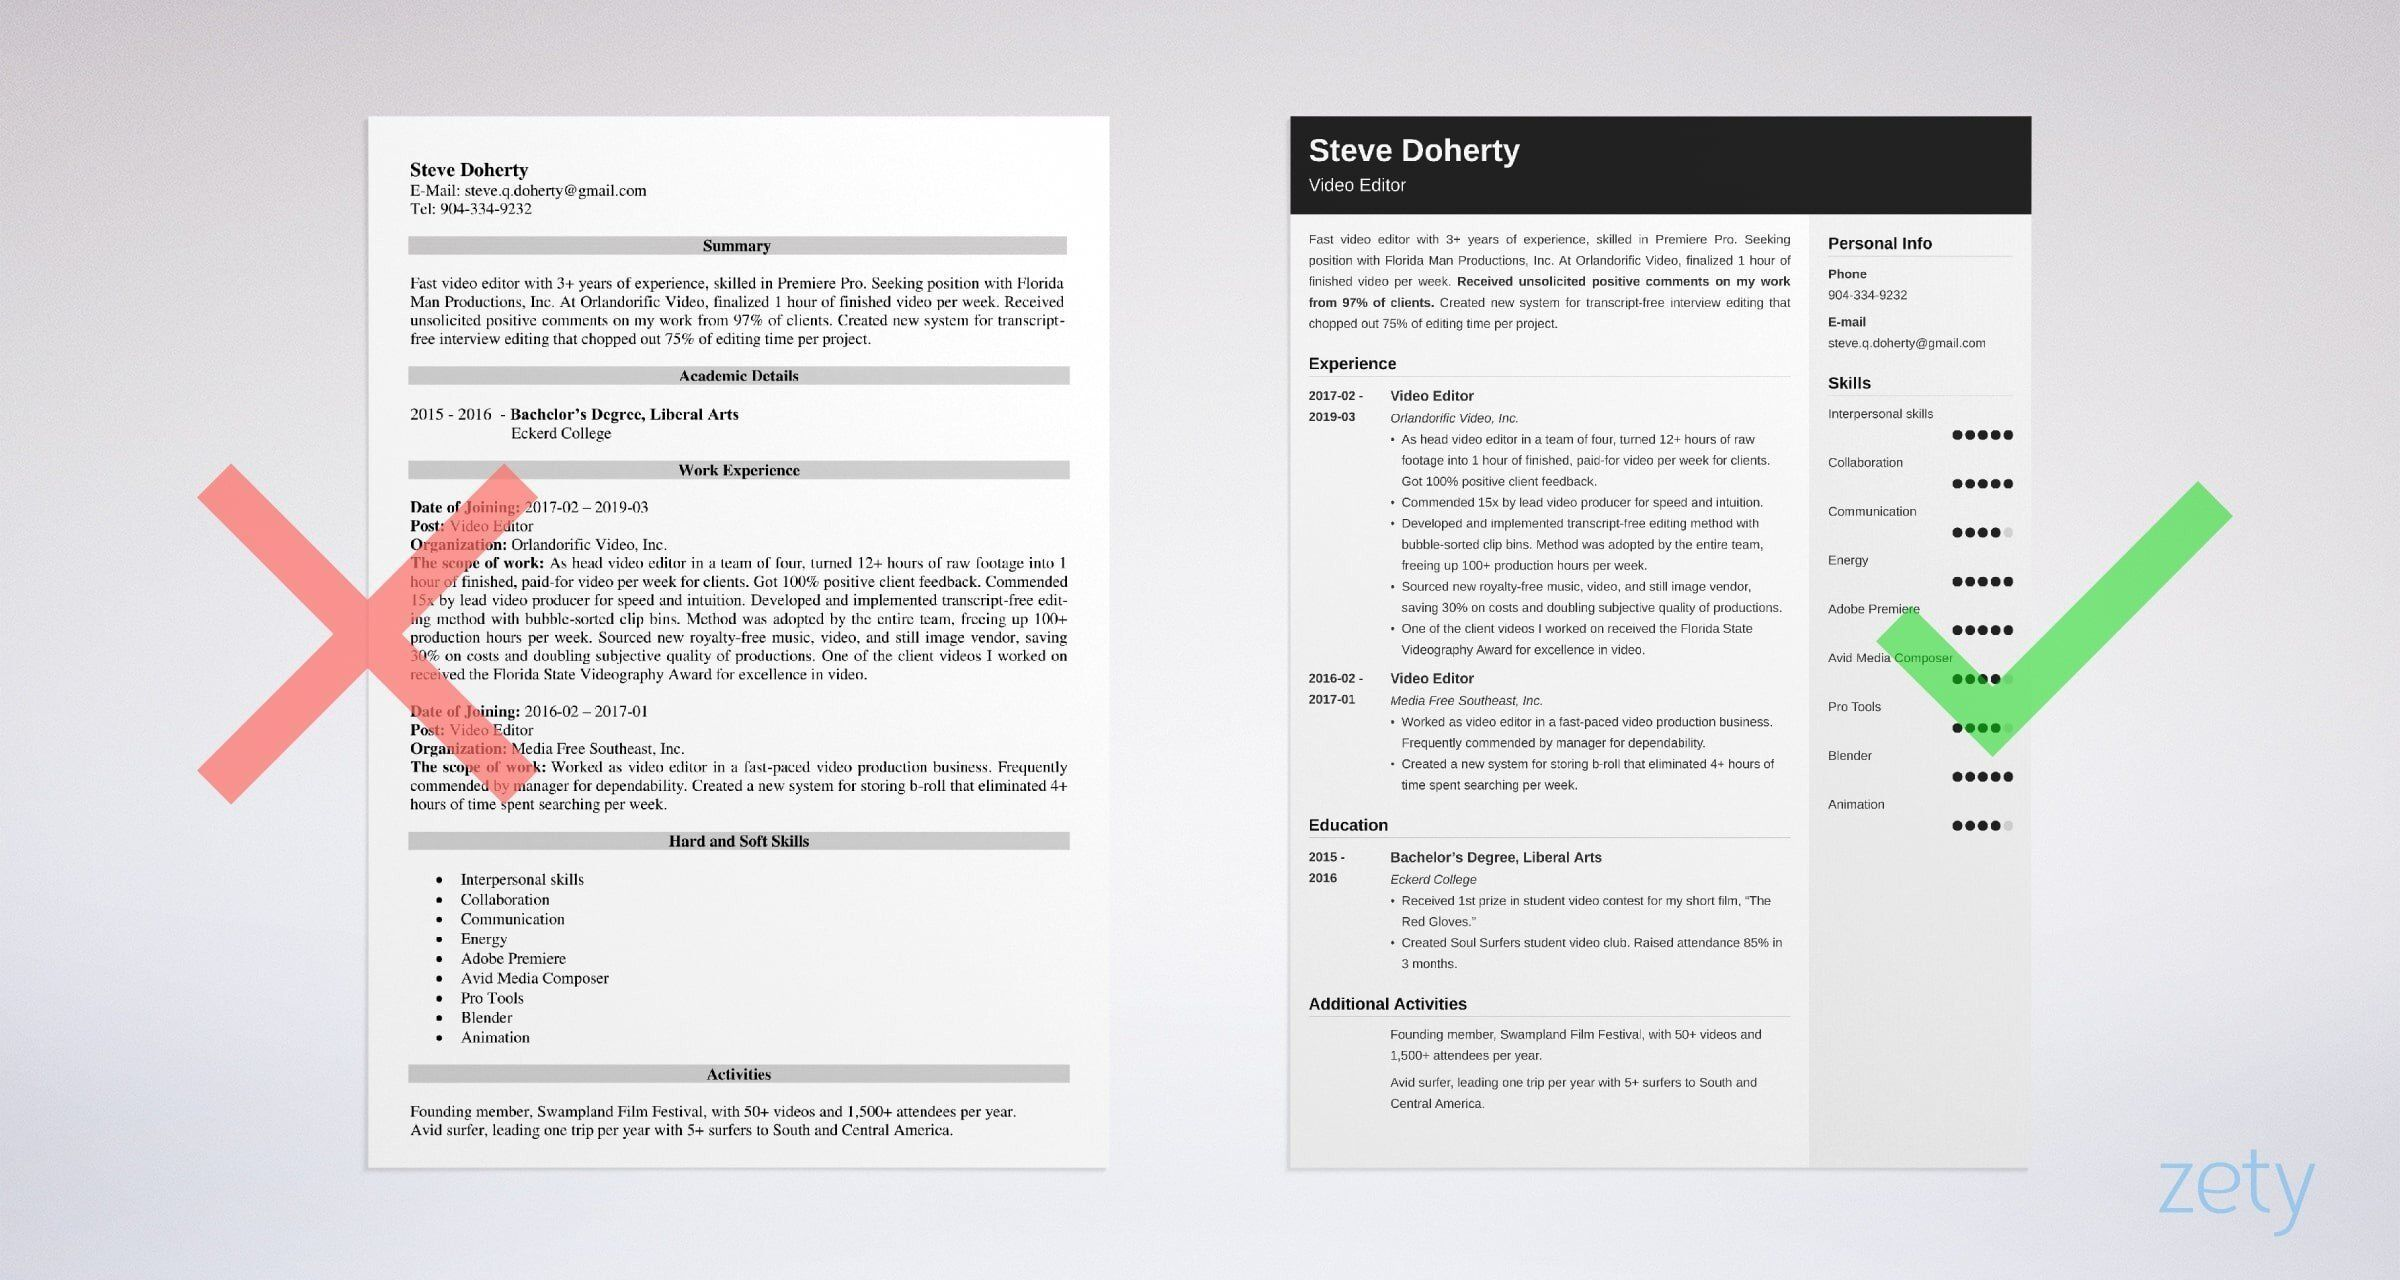 Resume editing services Teacher resume template, Teacher